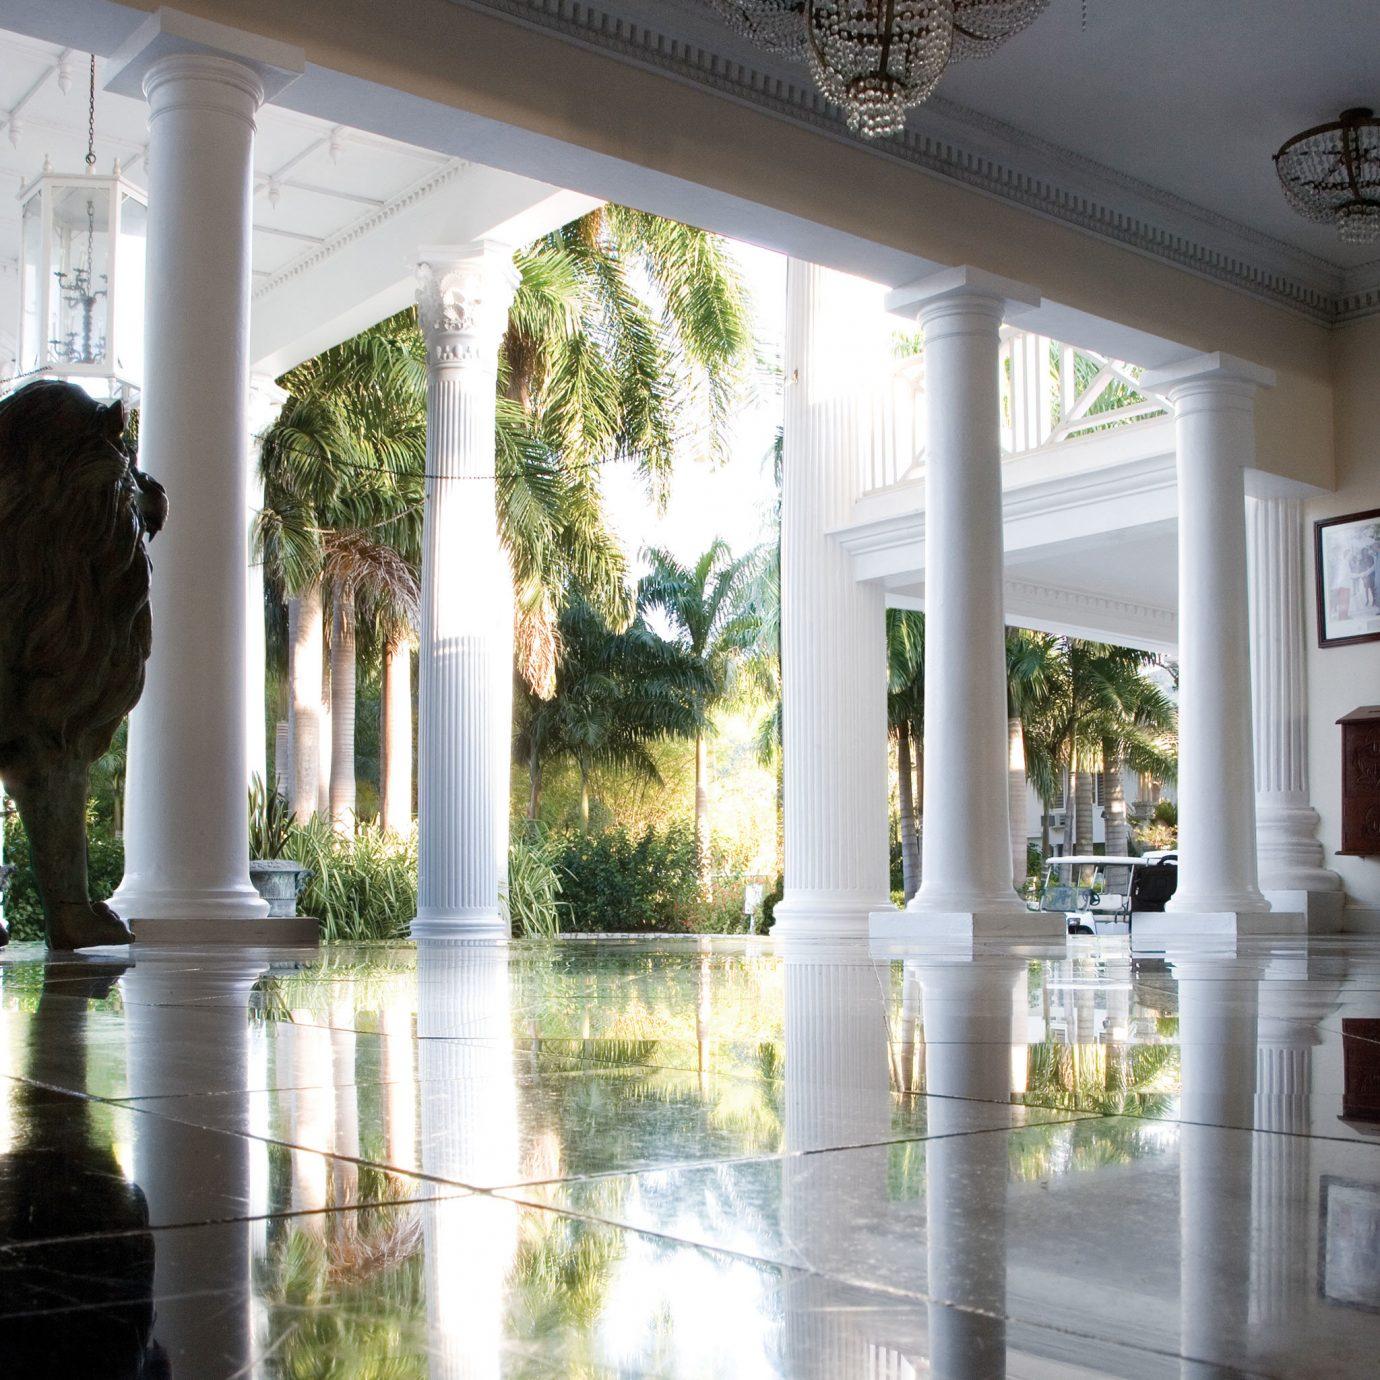 Island Lobby Luxury Modern standing tourist attraction museum